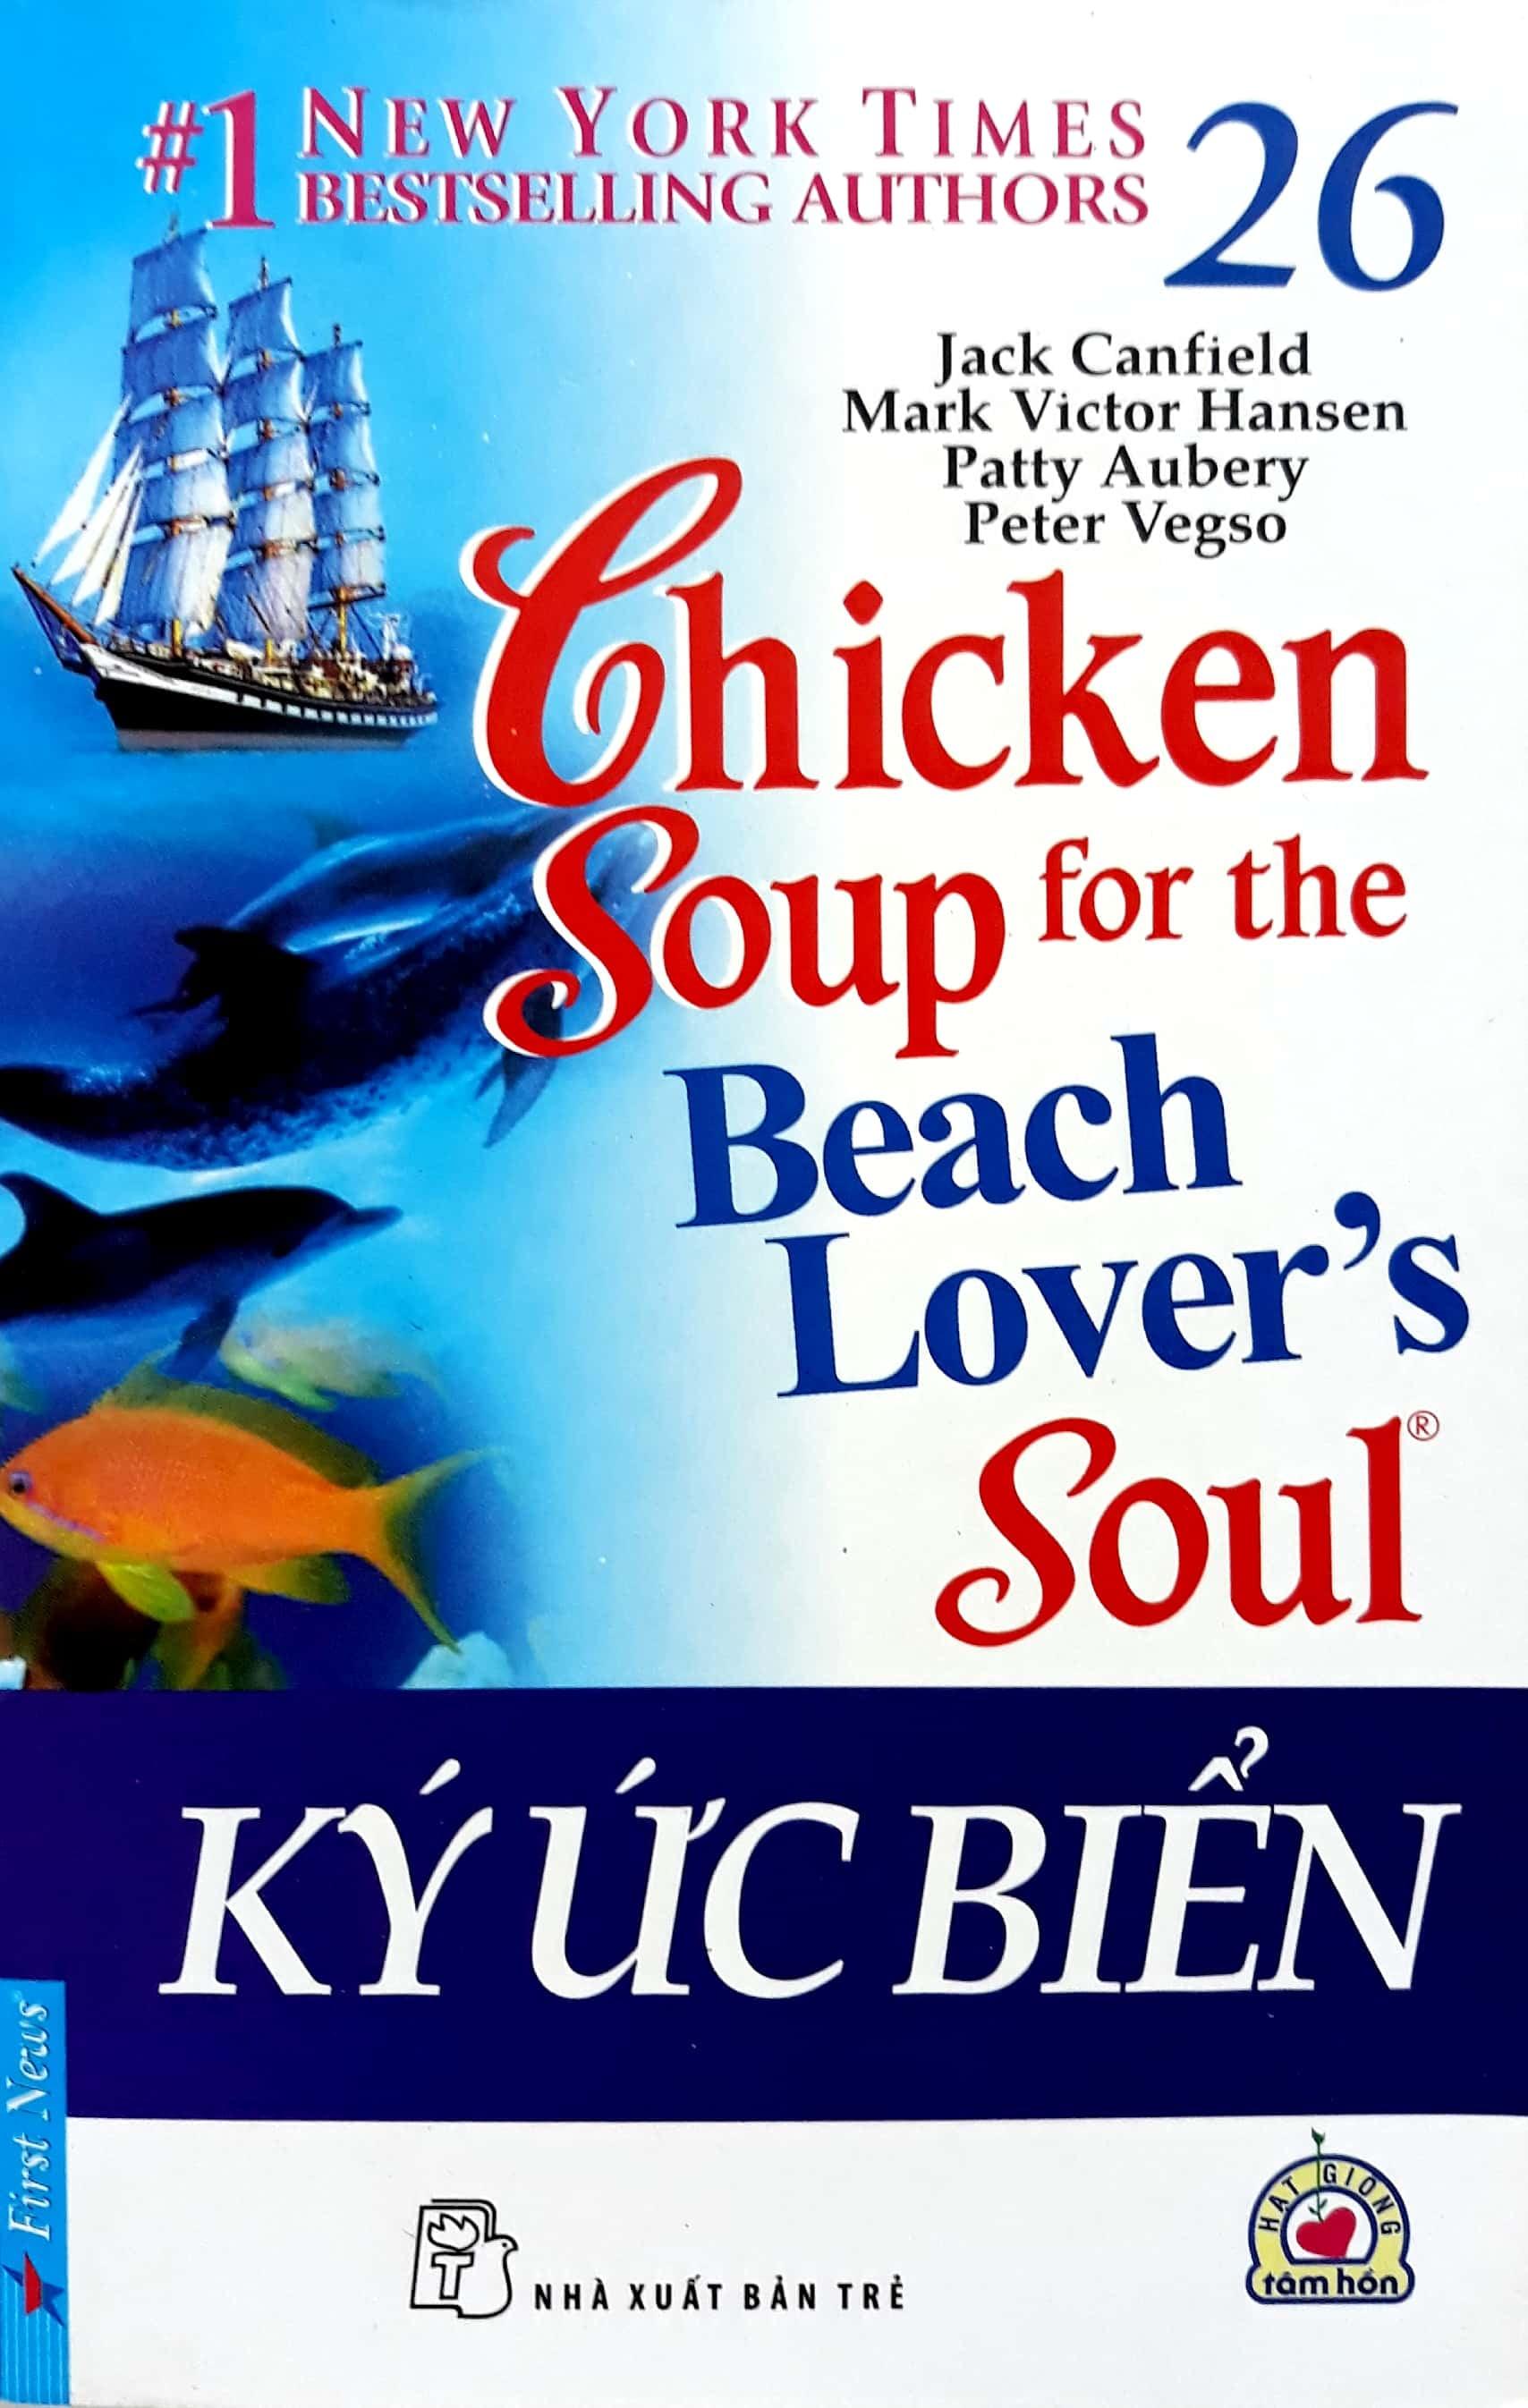 CHICKEN SOUP FOR THE BEACH LOVER'S SOUL 26 – KÝ ỨC BIỂN